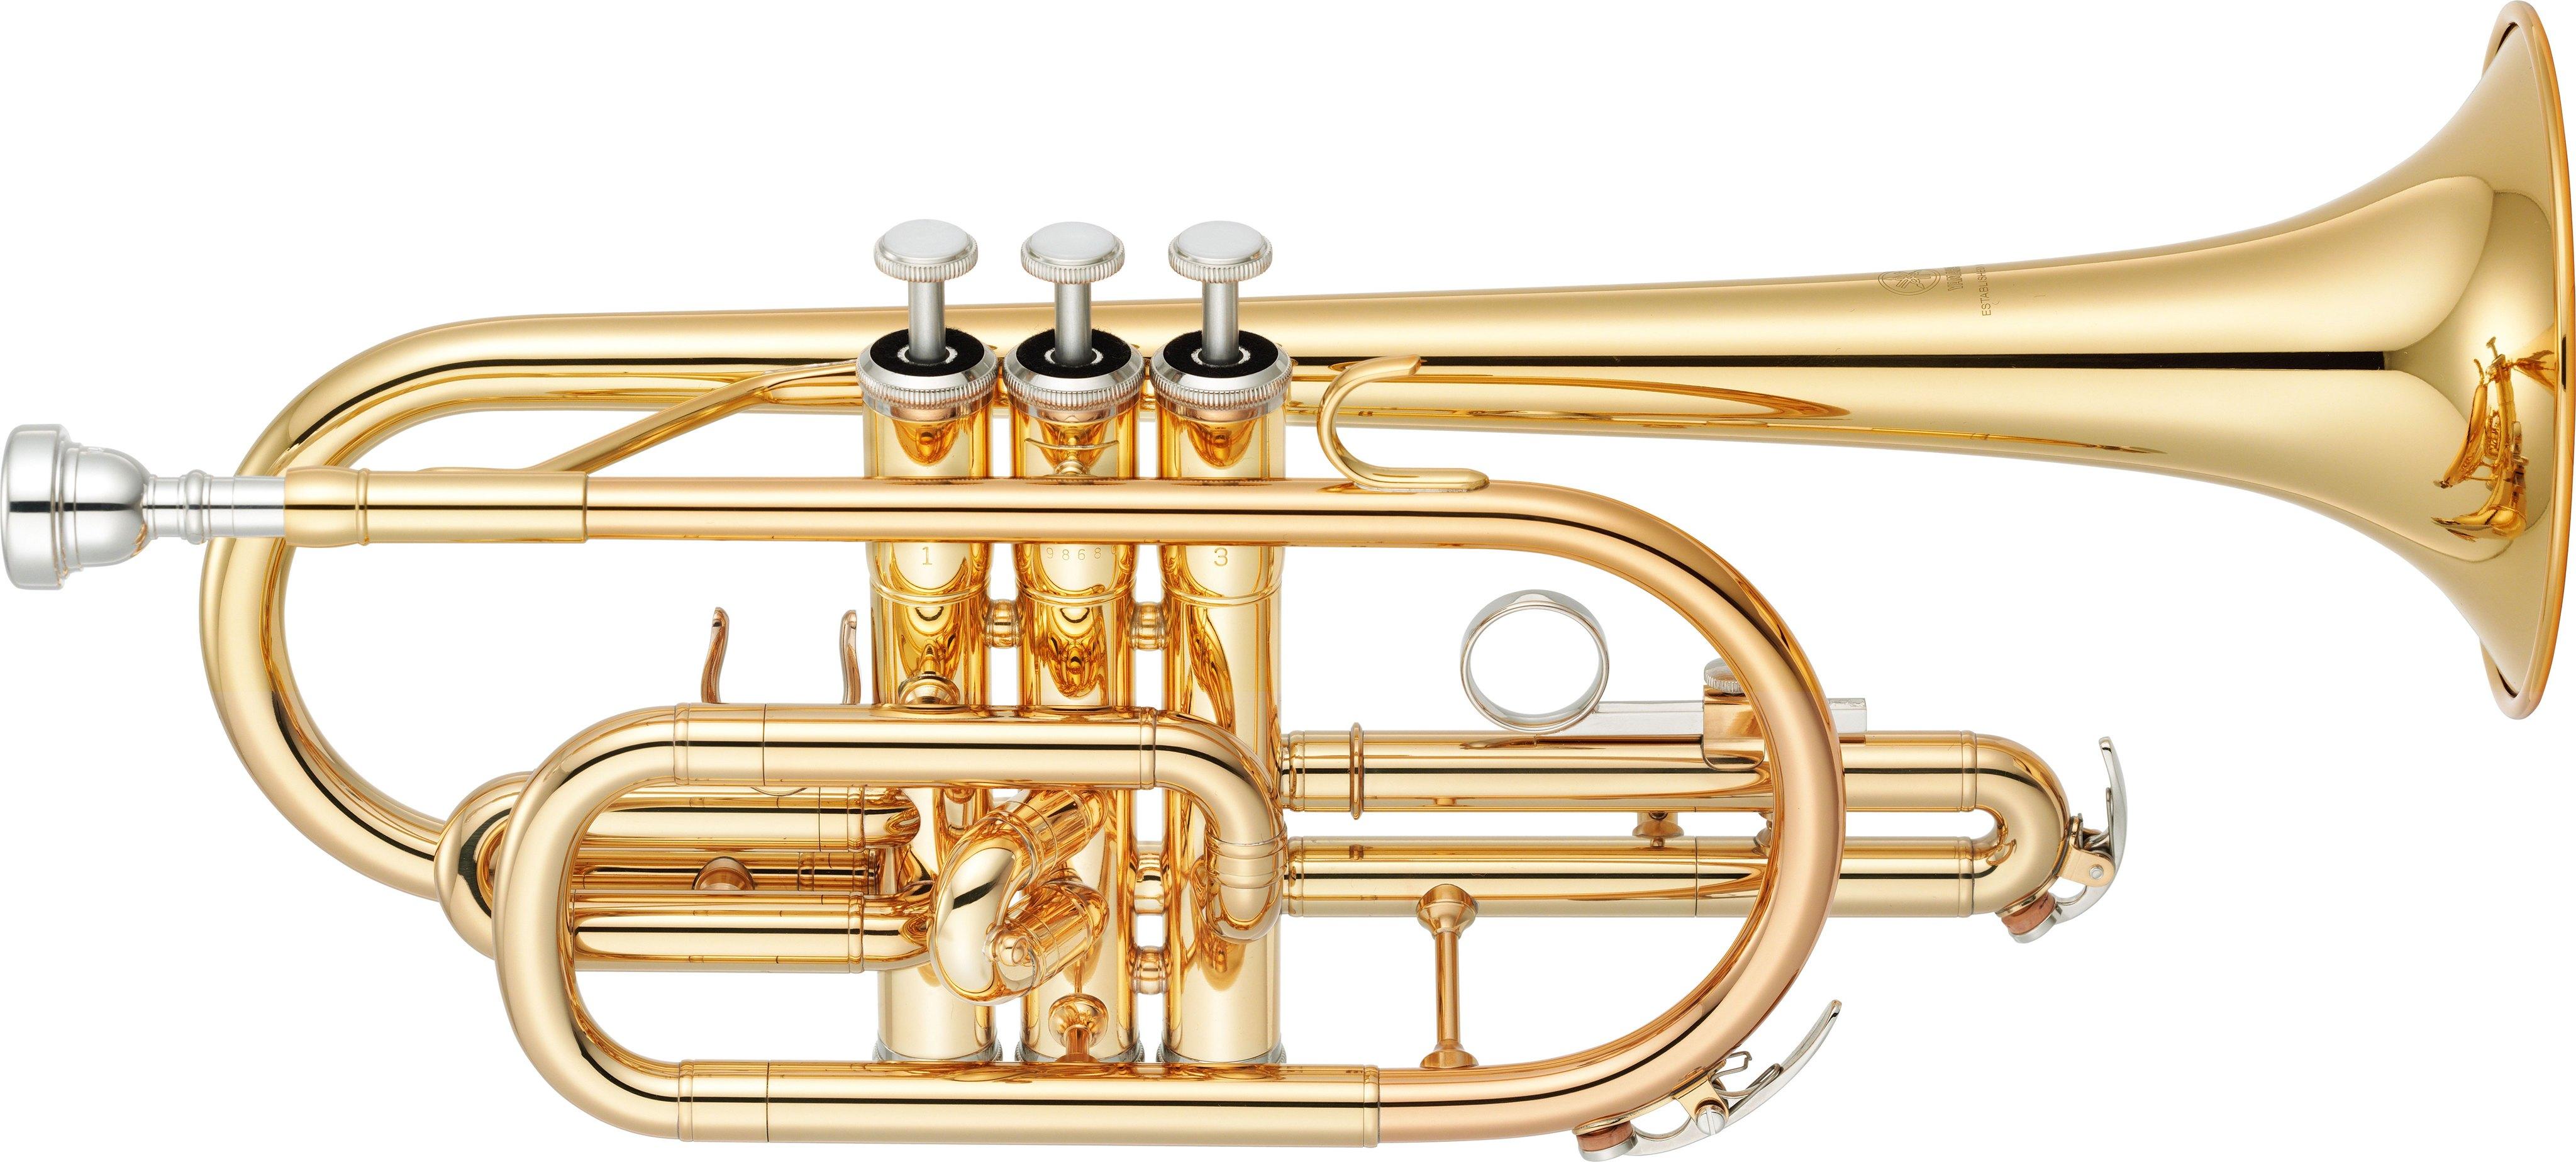 Ycr-2310iii - Oversikt - Kornetter - Messing  U0026 Trebl U00e5s - Musikkinstrumenter - Produkter